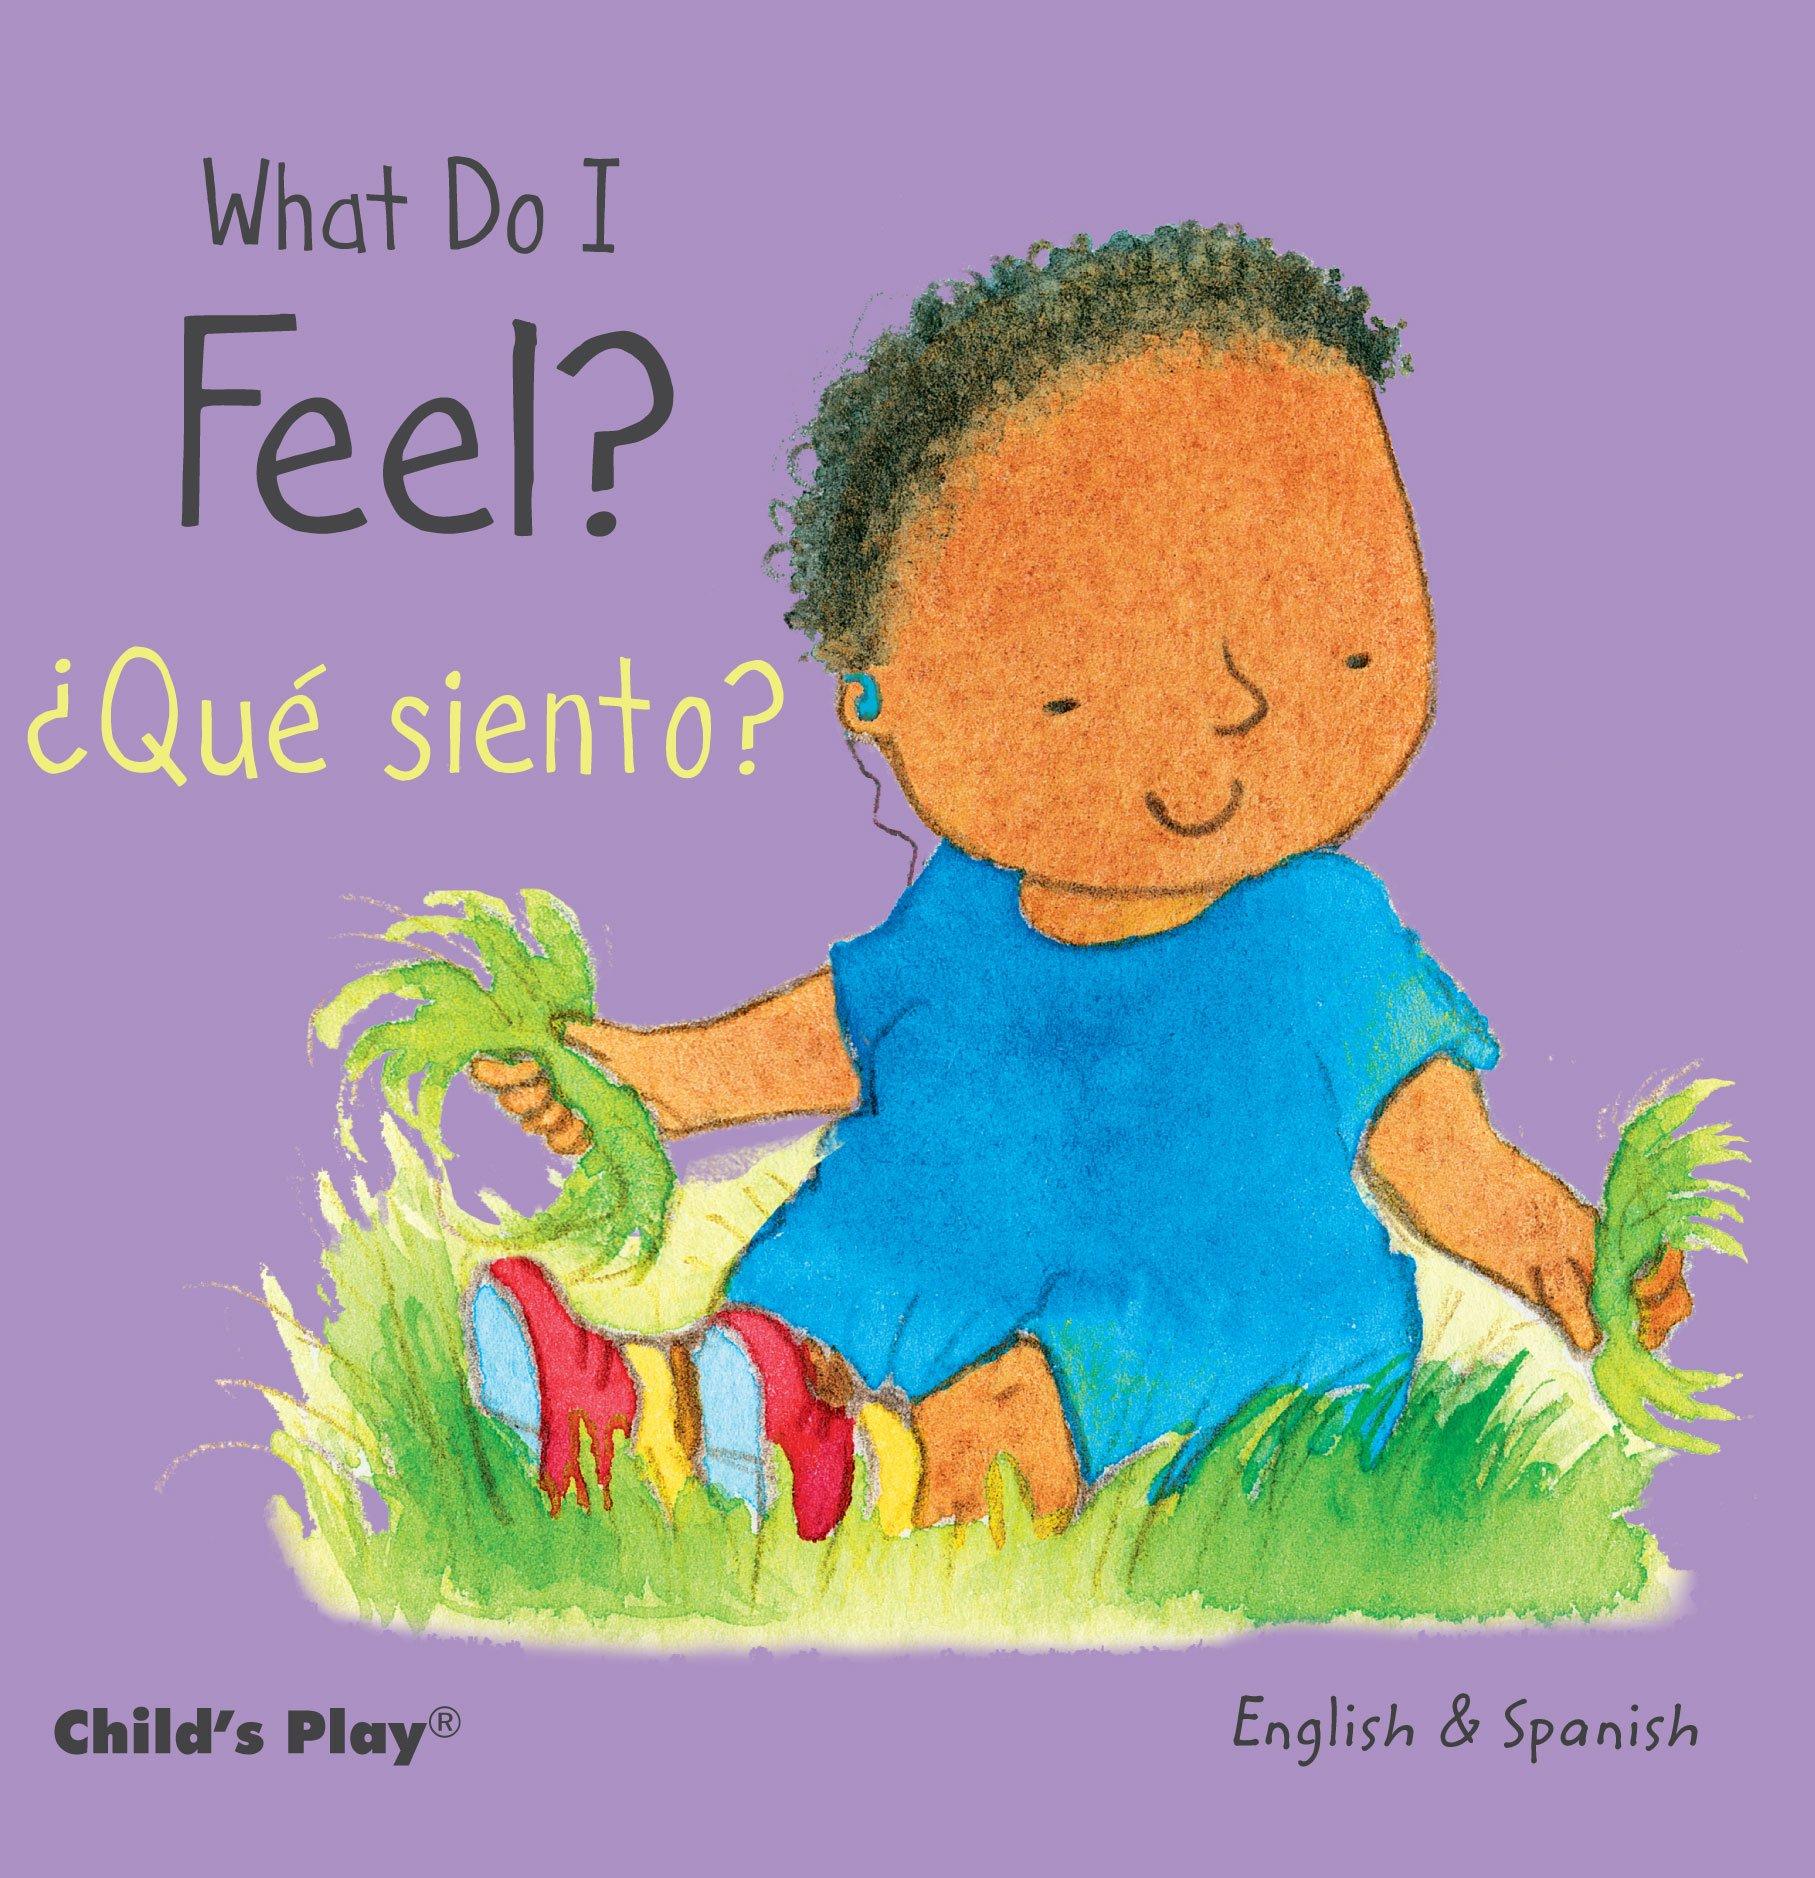 What Do I Feel? / ¿Qué siento? (Child's Play - Bilingual Titles) (Inglés) Libro de cartón – 1 abr 2015 Annie Kubler Teresa Mlawer 1846437210 Board books